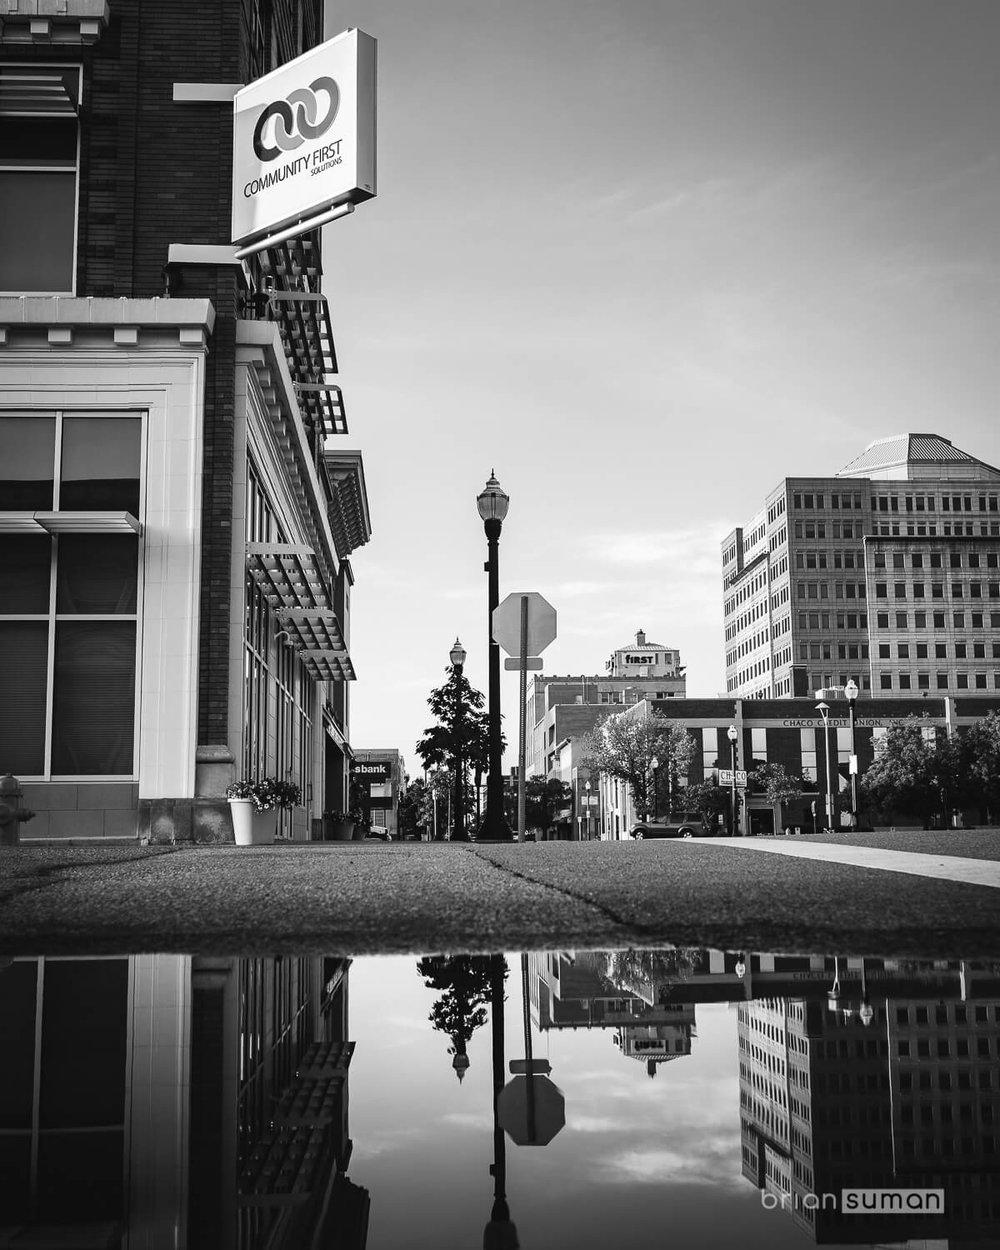 Hamilton - Community First-0001-Brian Suman Photography.jpg